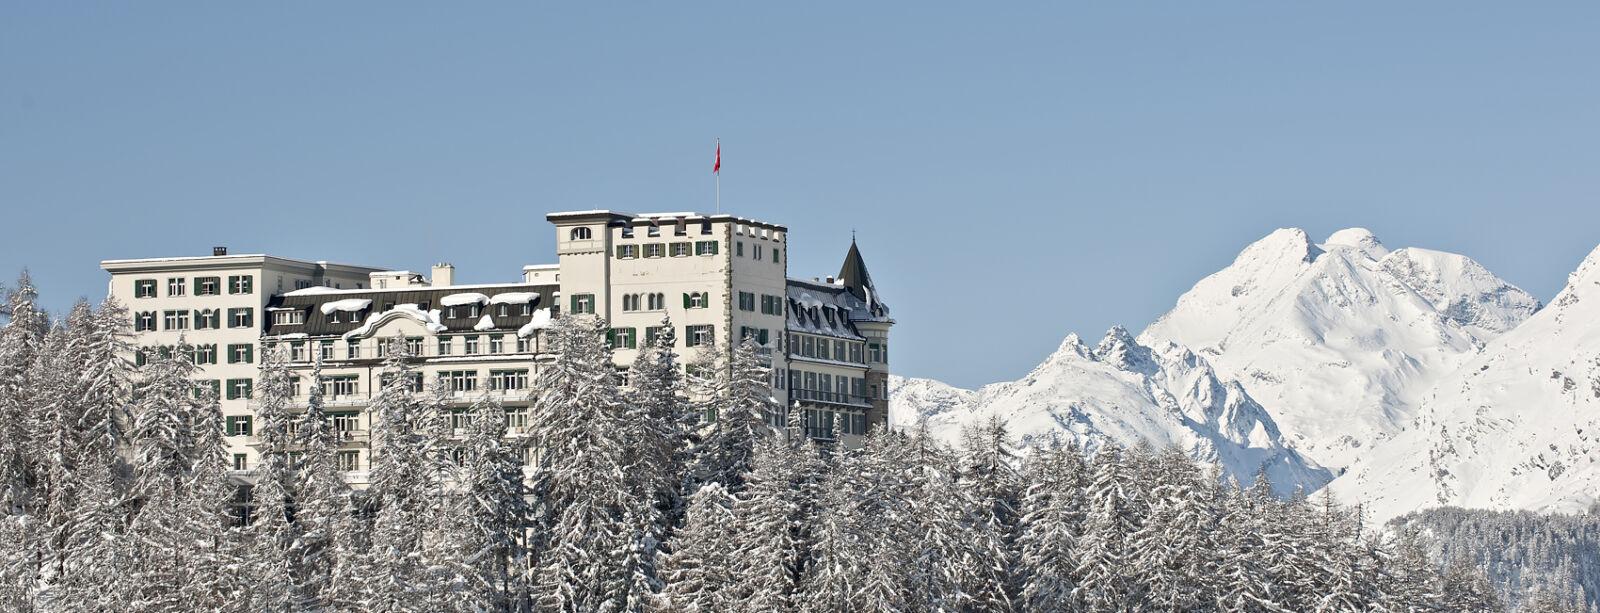 Exterior view winter - Hotel Waldhaus Sils